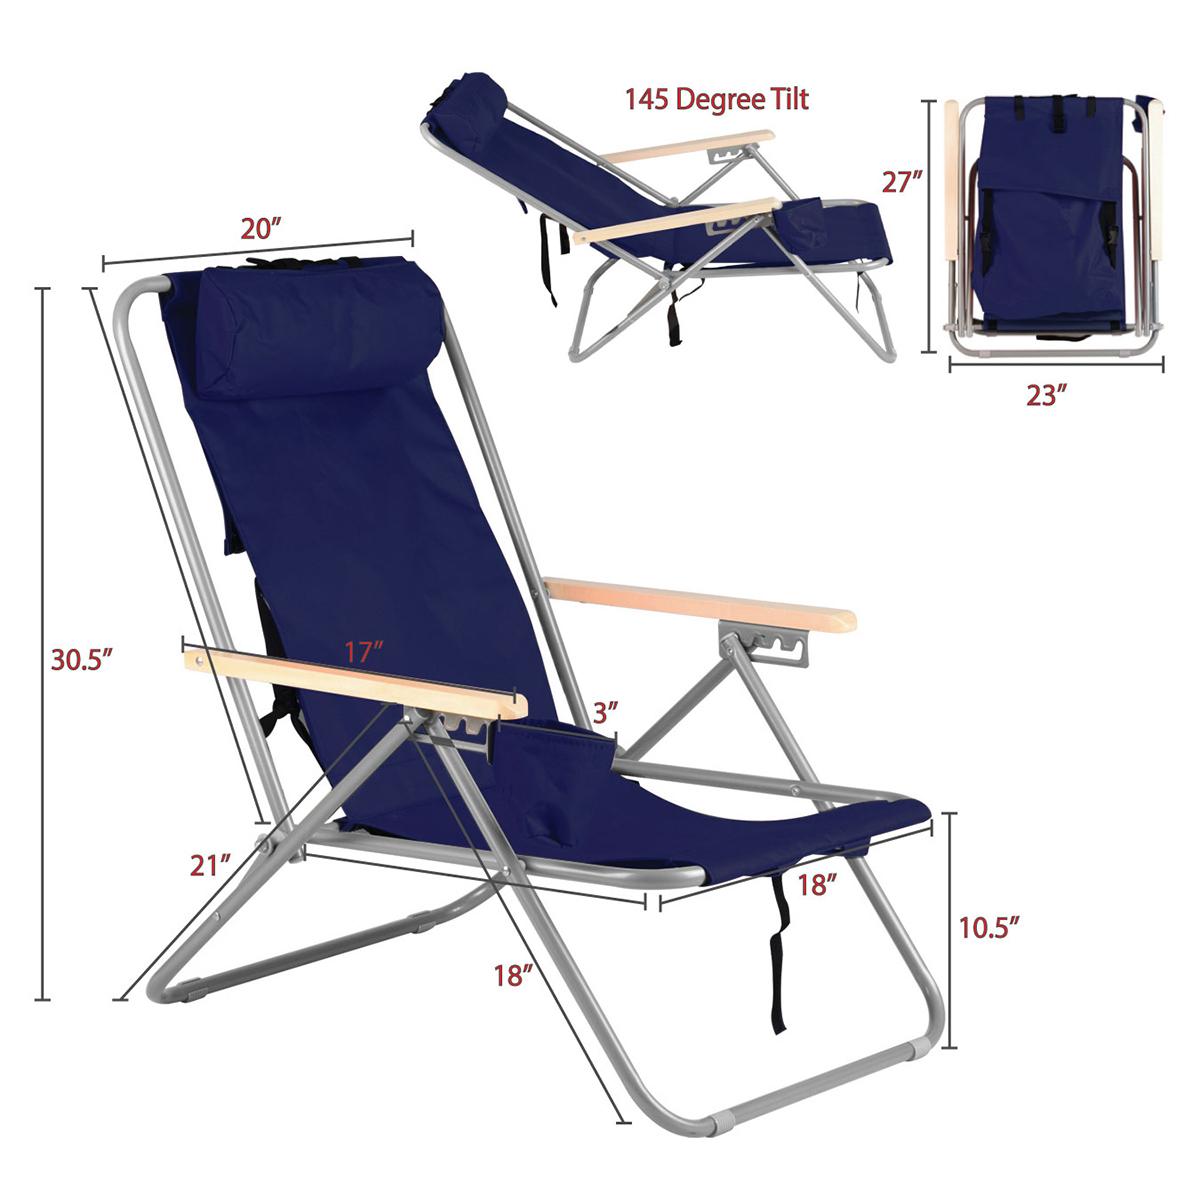 portable beach chair ergonomic seat cushion blue backpack folding solid